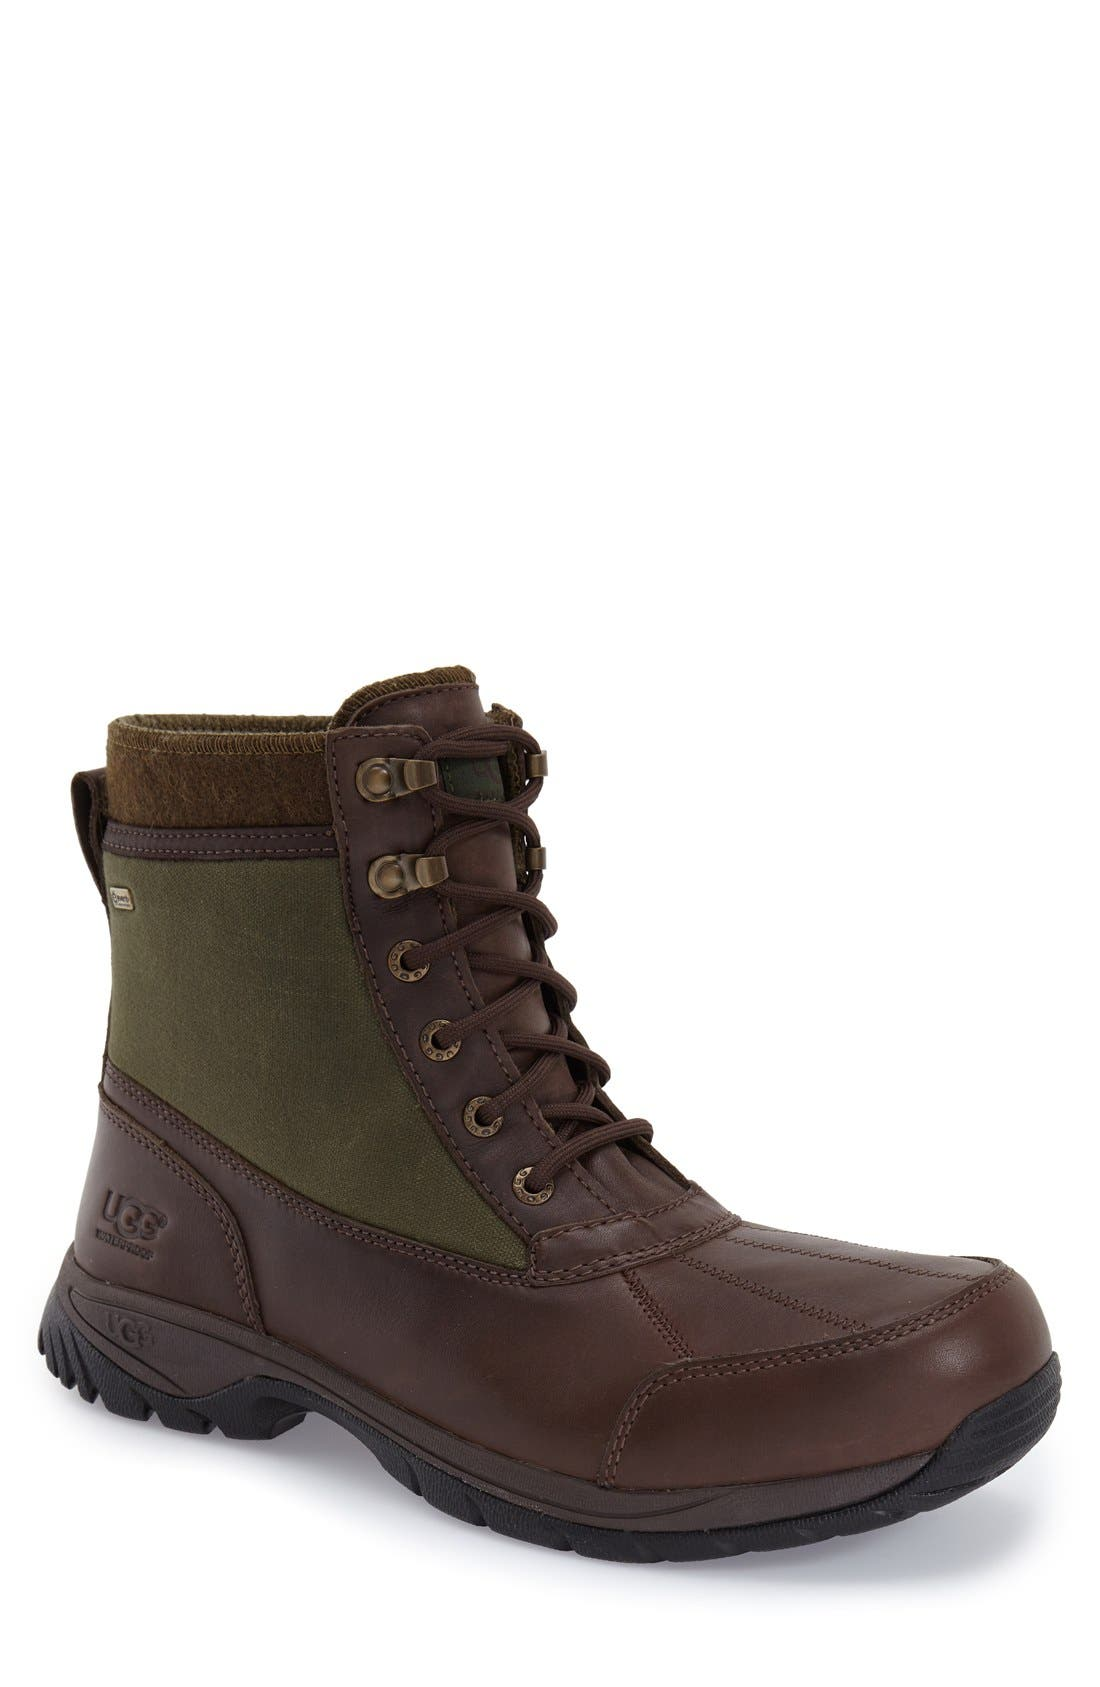 Main Image - UGG® 'Eaglin' Waterproof Snow Boot